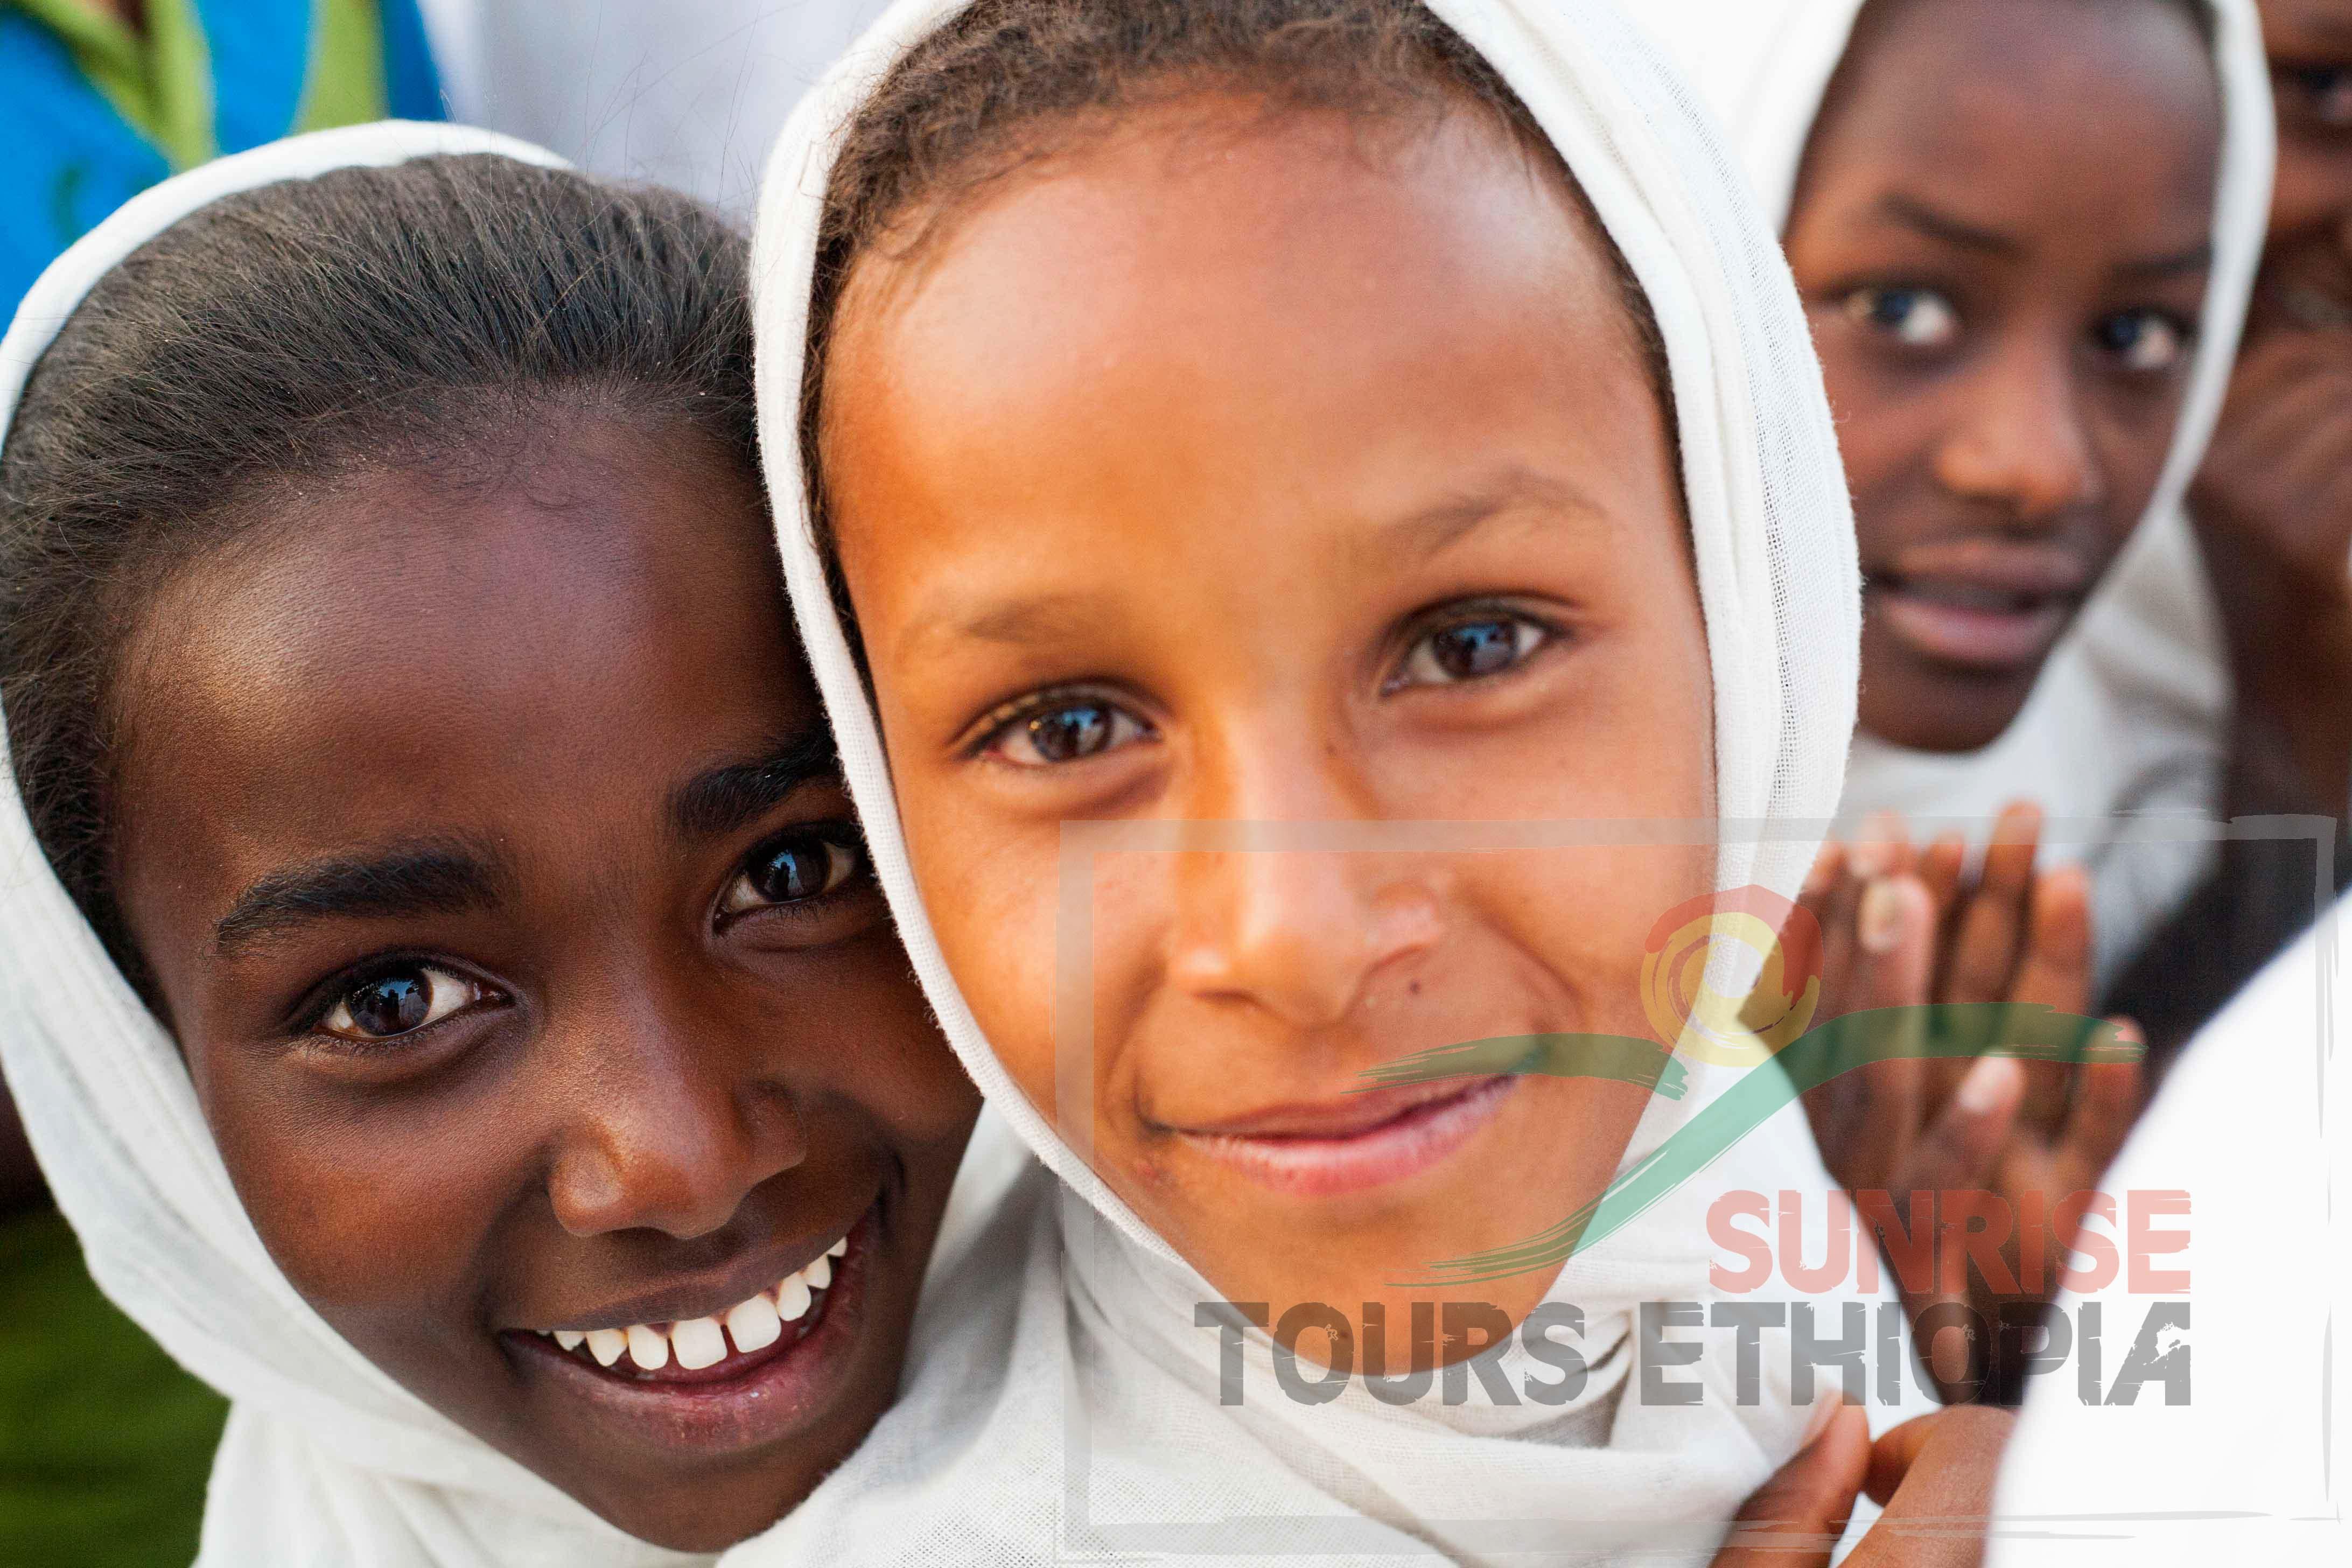 SMILING CHILDREN ZIWAY ETHIOPIA NETHELA ORTHODOX